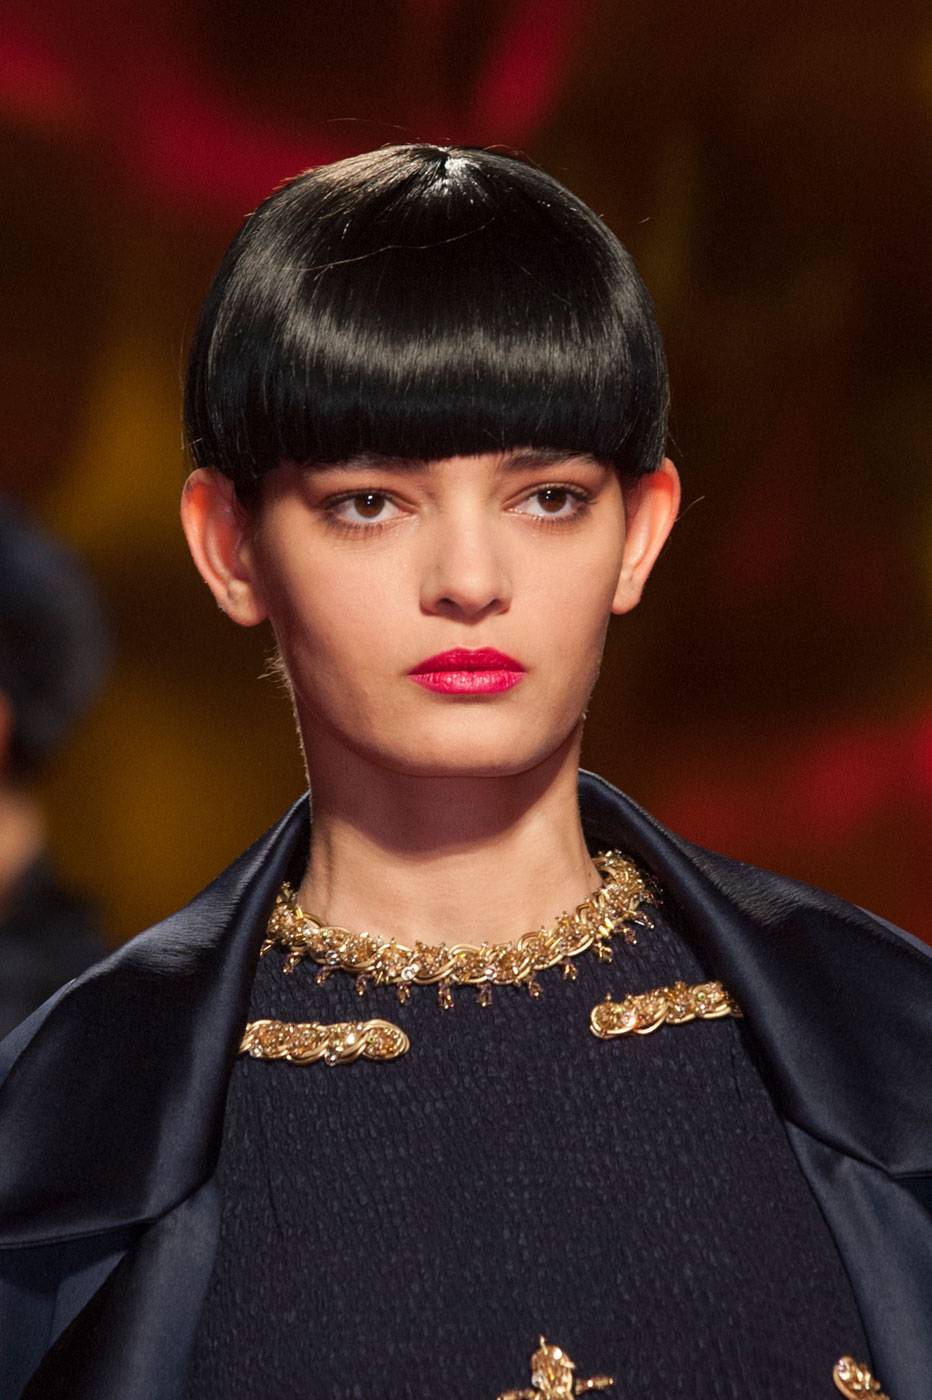 Schiaparelli-fashion-runway-show-close-ups-haute-couture-paris-spring-summer-2015-the-impression-11